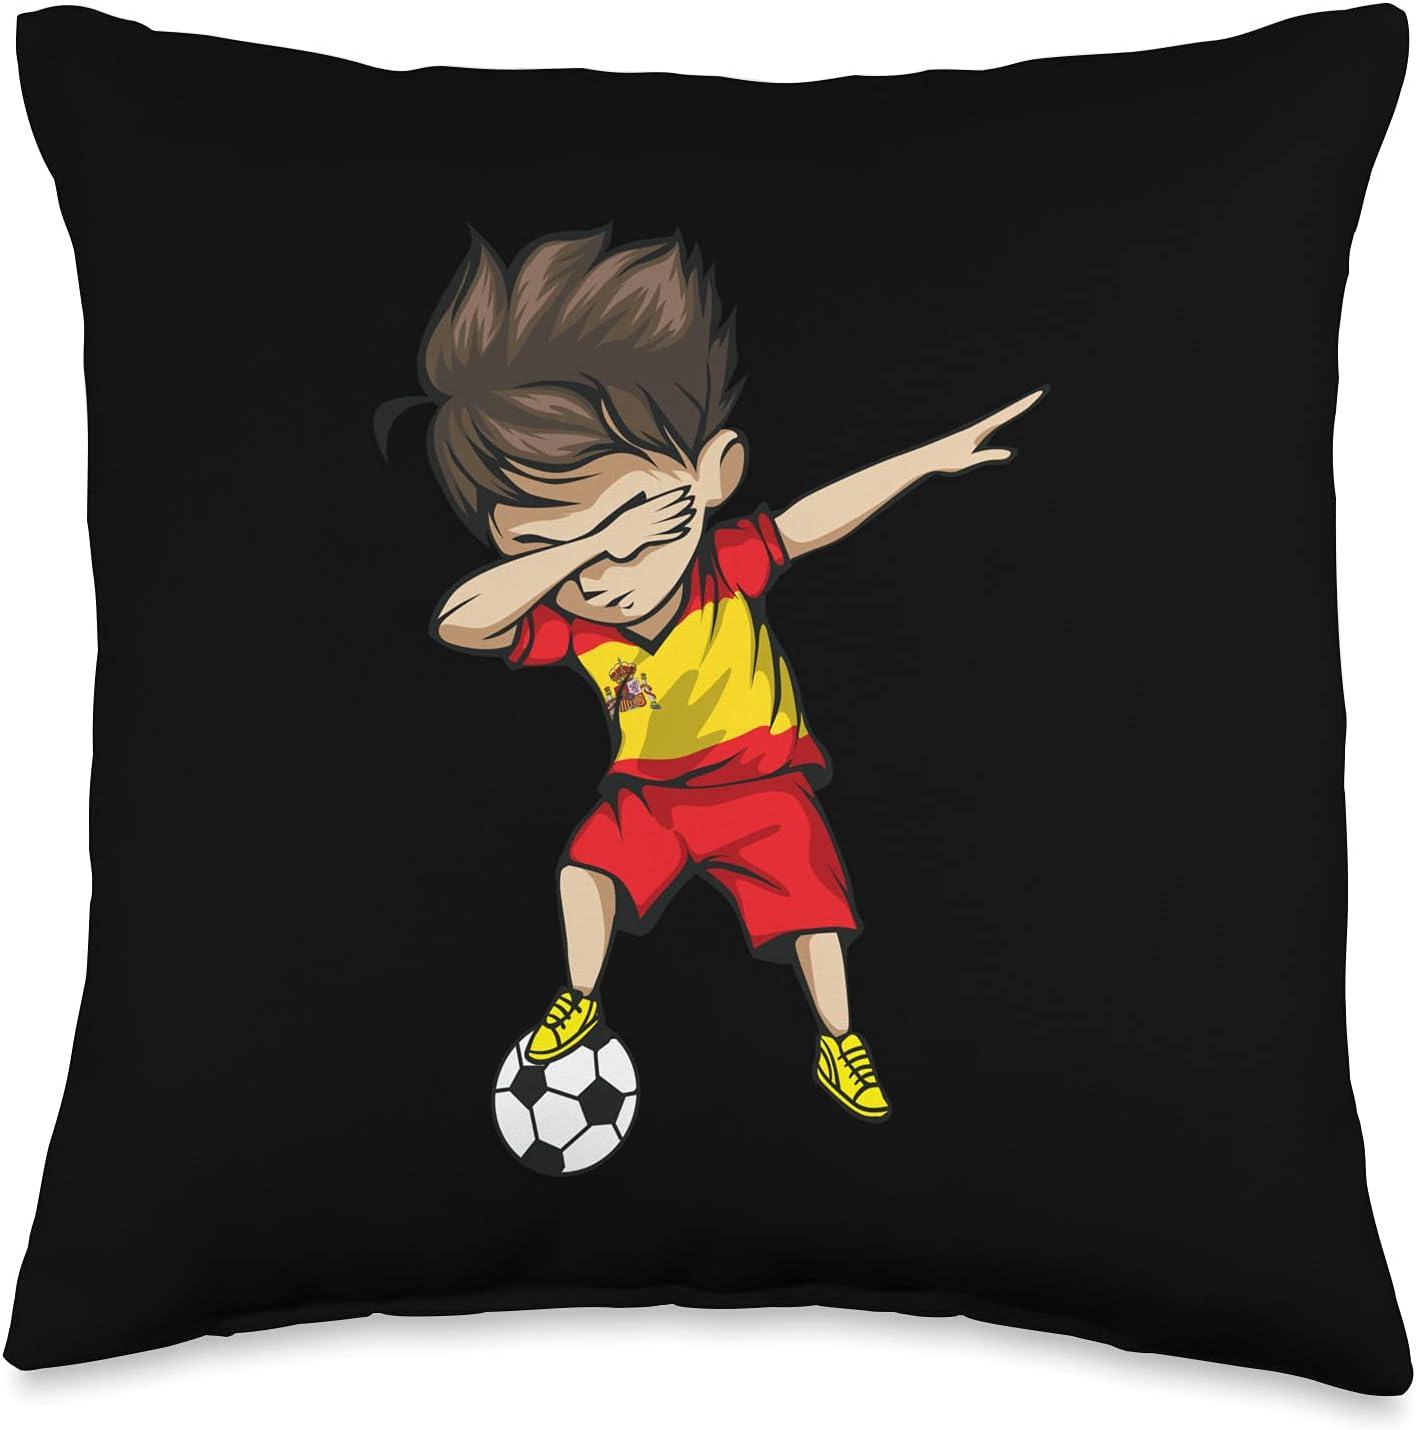 National Team Flag Dab Dance Soccer Boys Designs Dabbing Soccer Boy Spain Jersey-Spanish Football Throw Pillow, 16x16, Multicolor